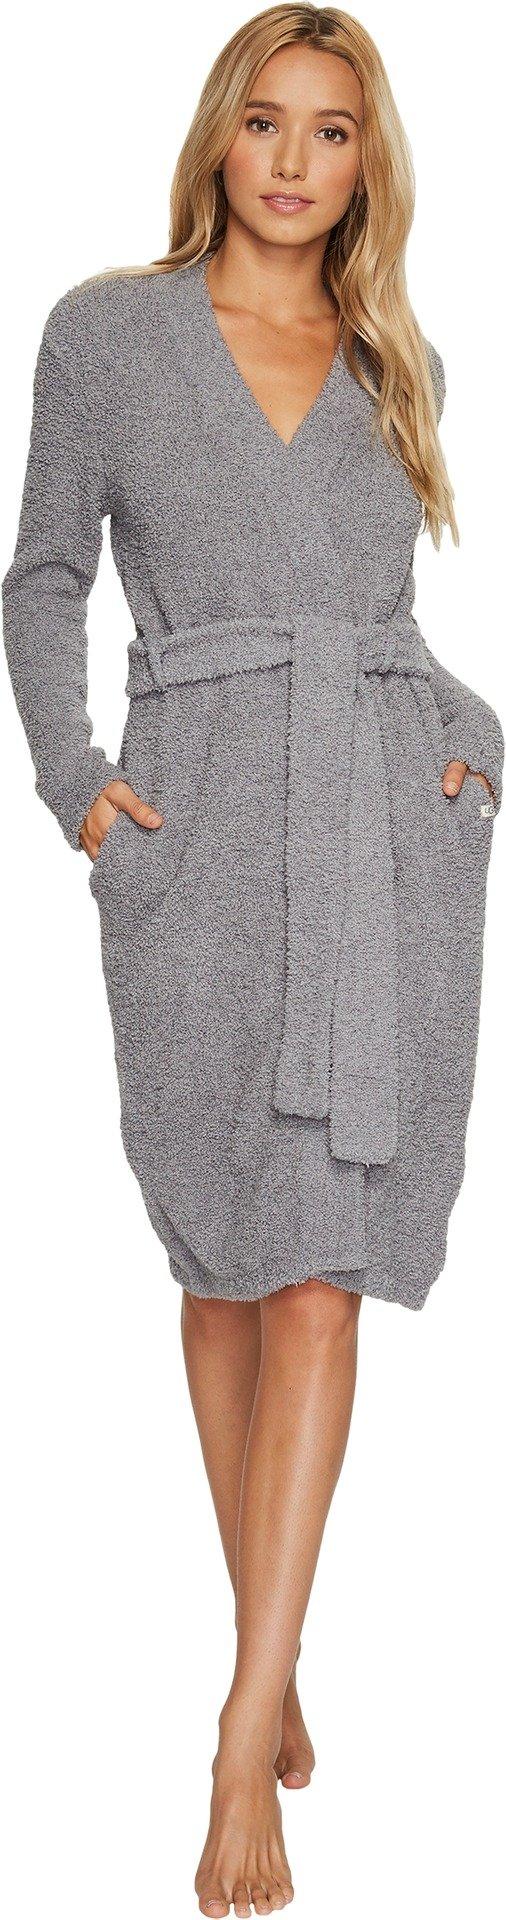 UGG Women's Ana Robe Grey Medium